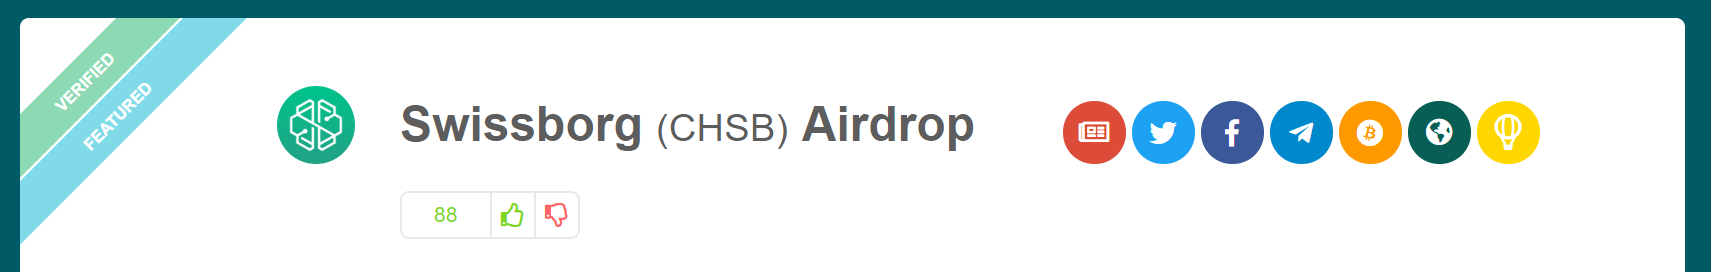 Verified airdrop